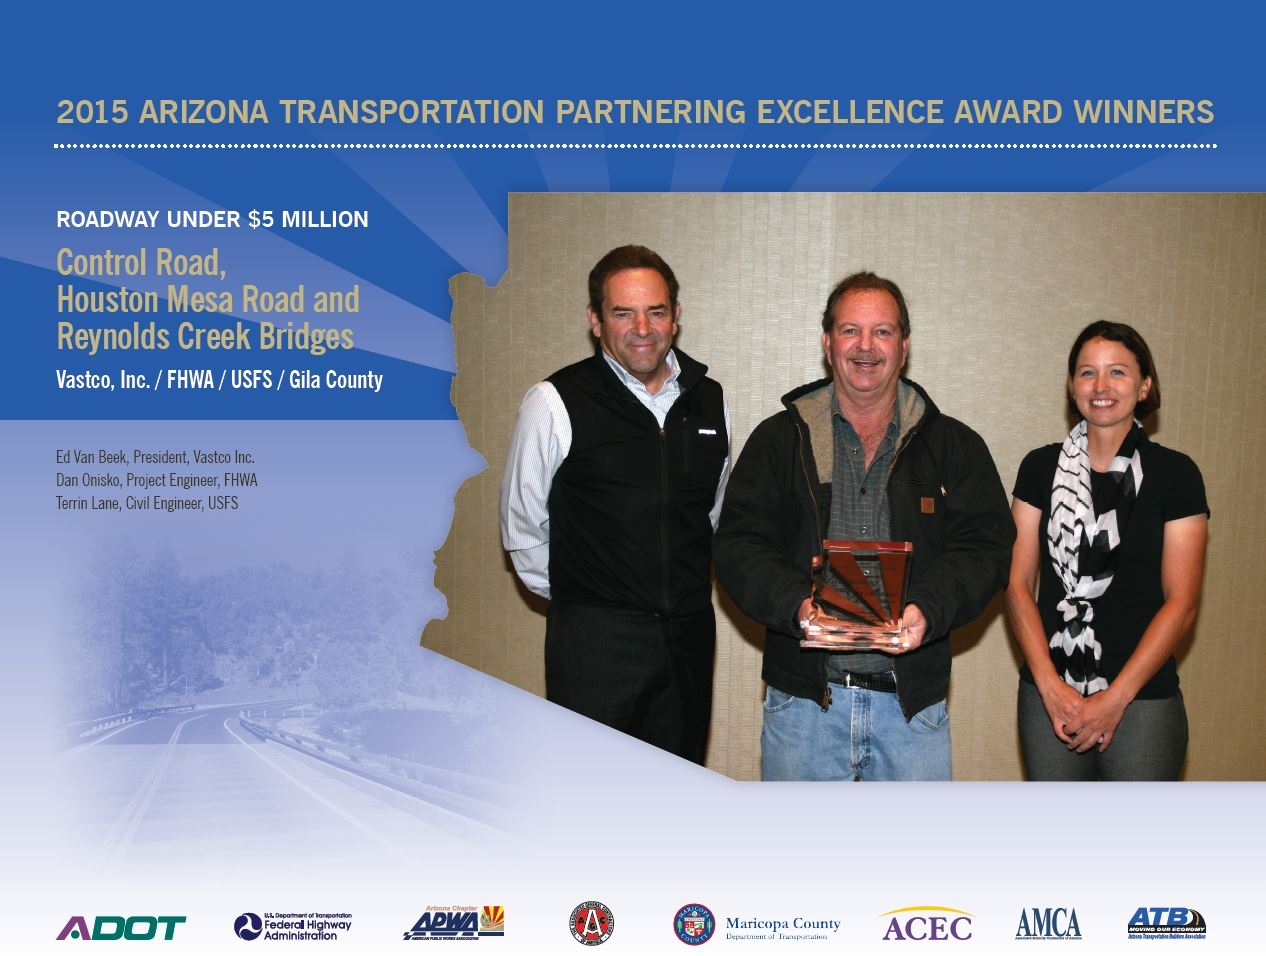 Arizona Transportation Partnering Excellence Award Winners